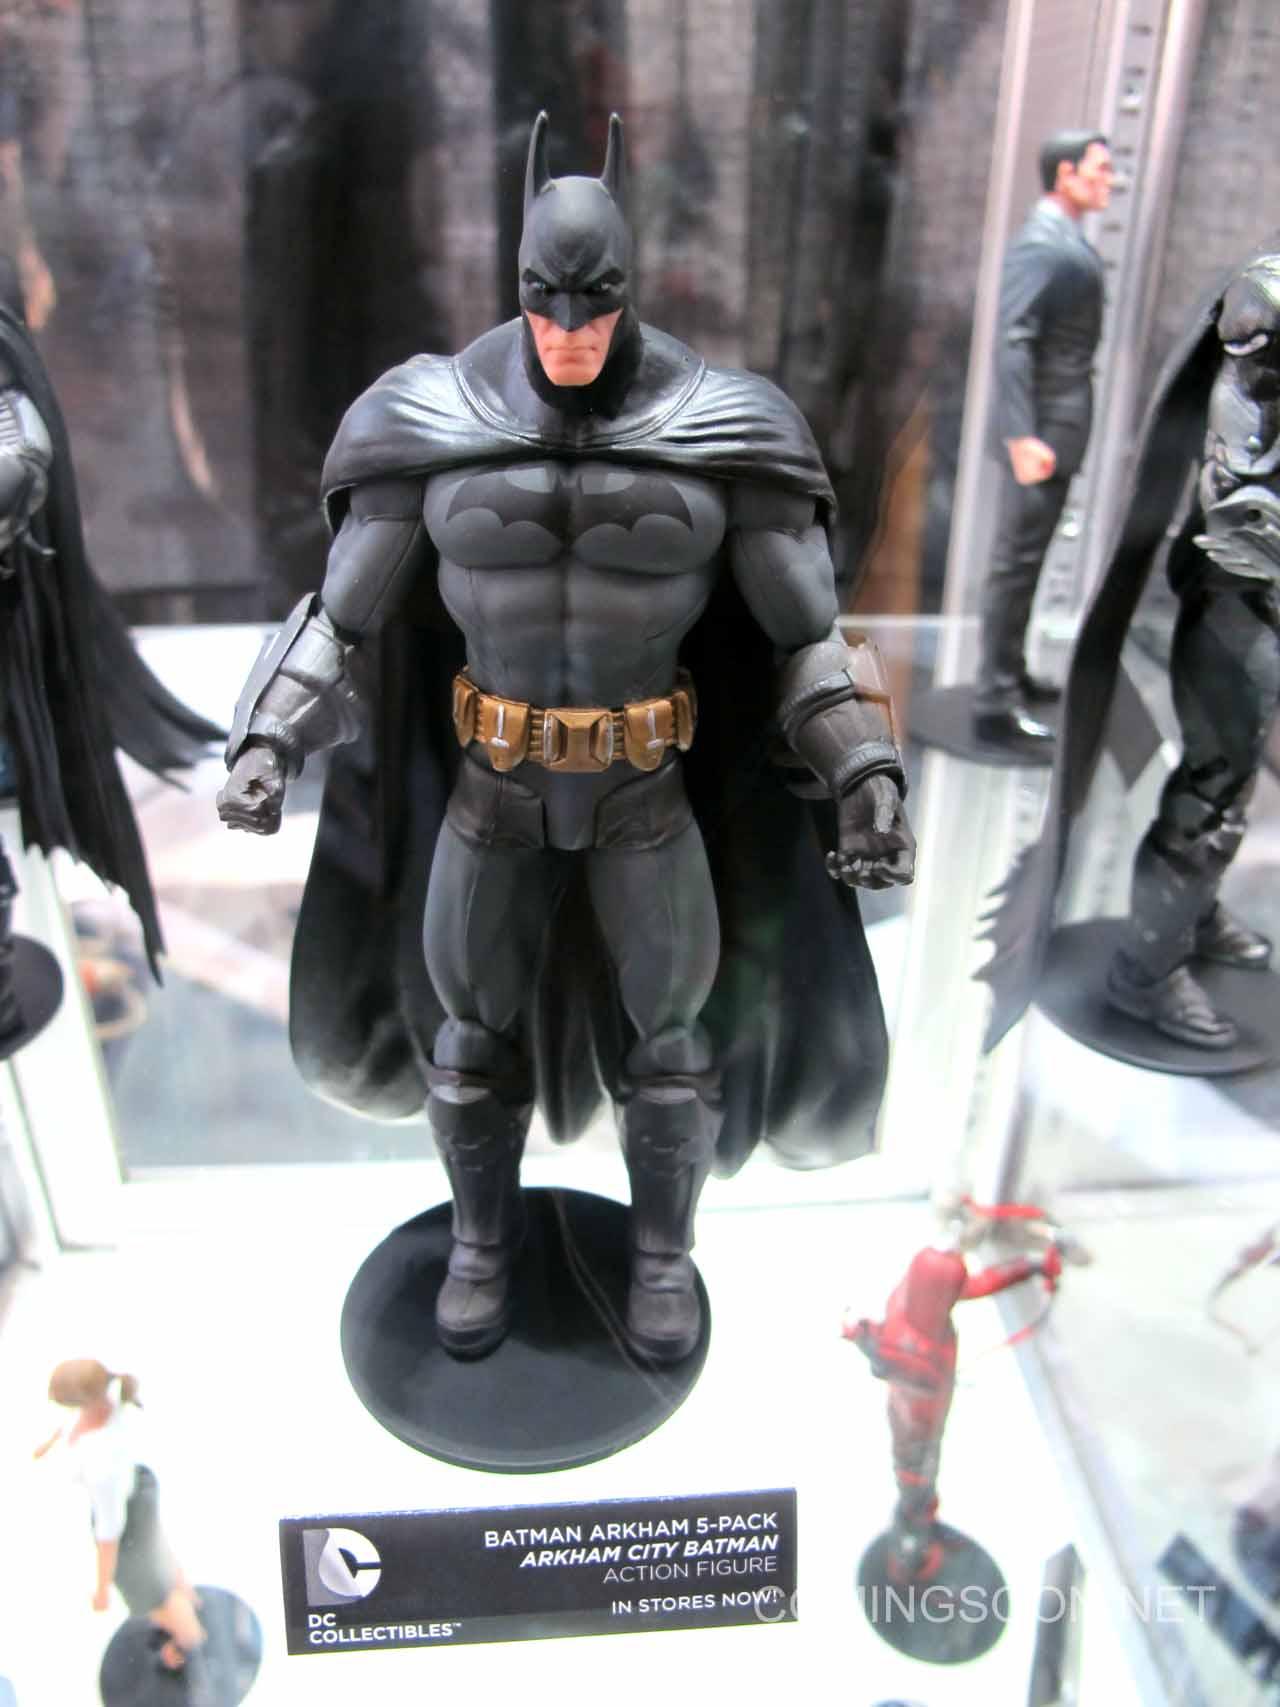 Batman from Arkham City